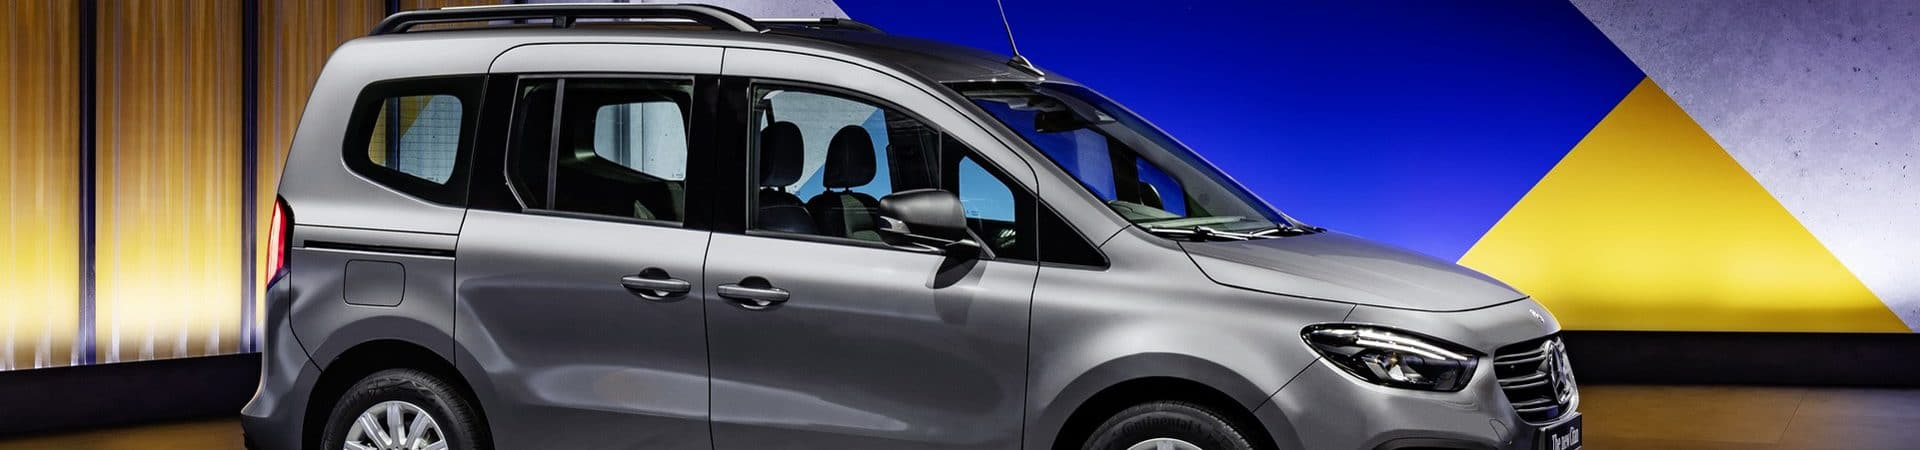 Citan, a última van não elétrica da Mercedes-Benz